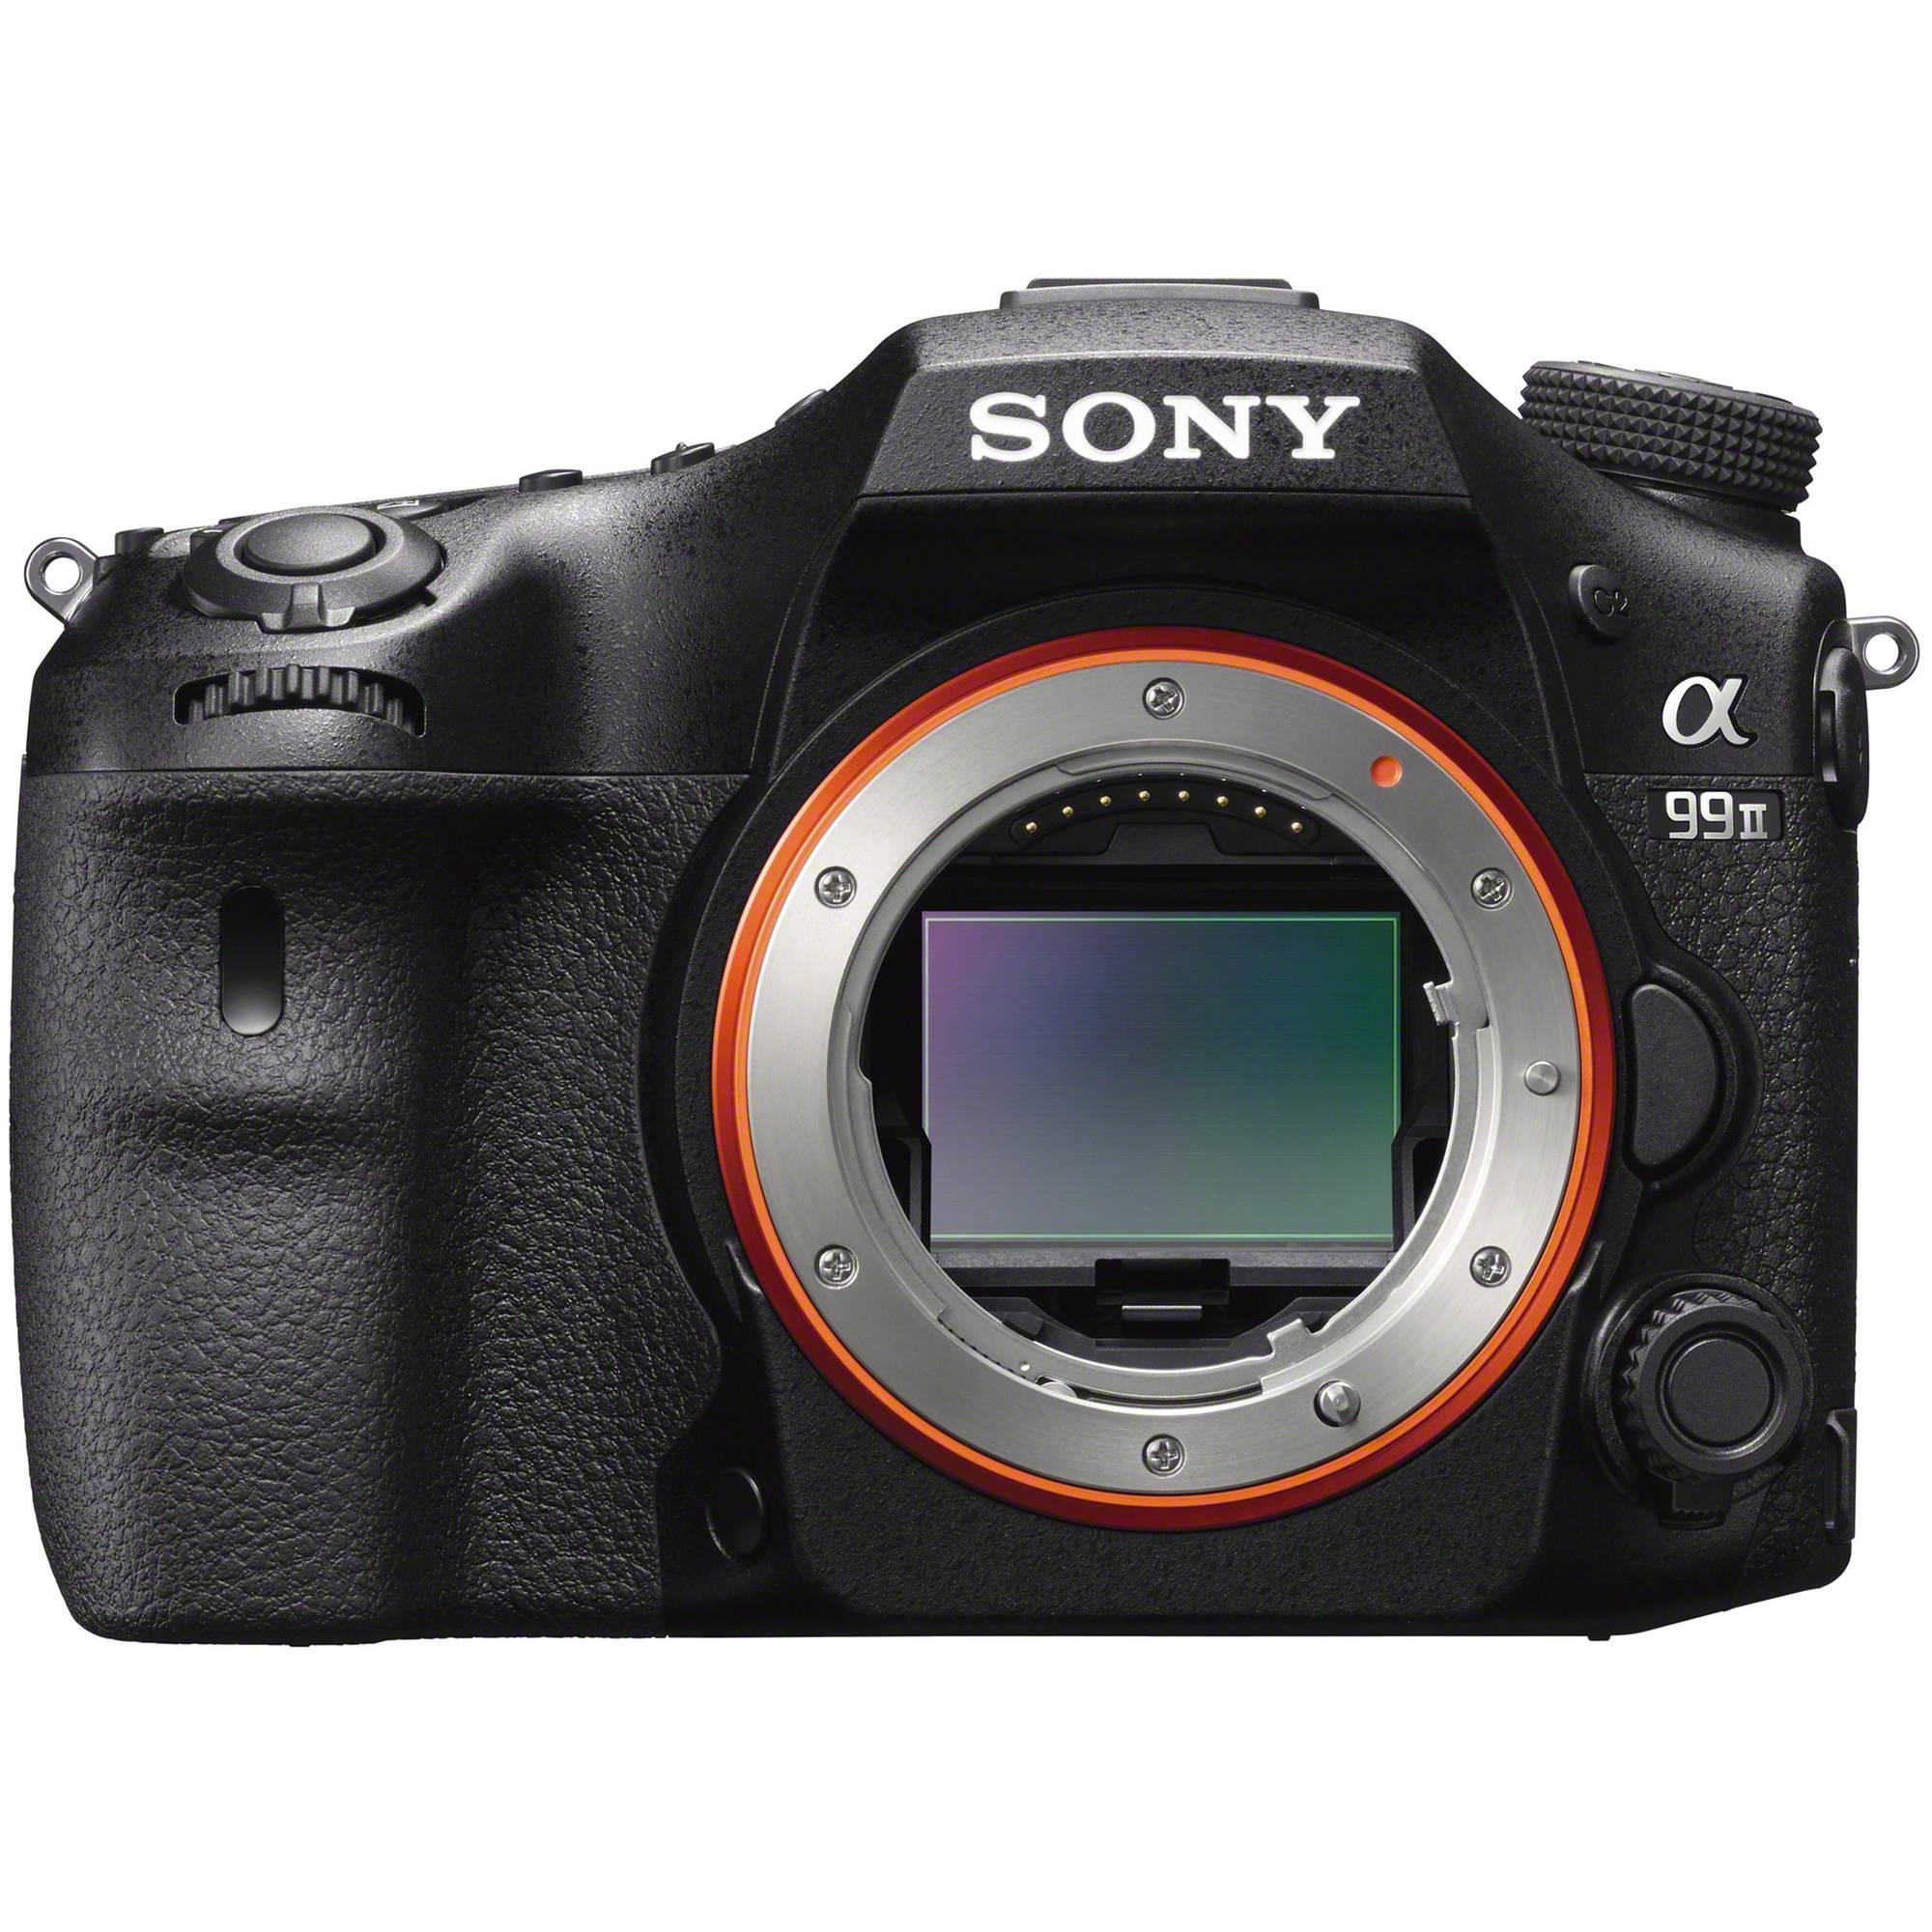 Sony-SLT-A99-II Sony SLT A99 II Review News and Reviews